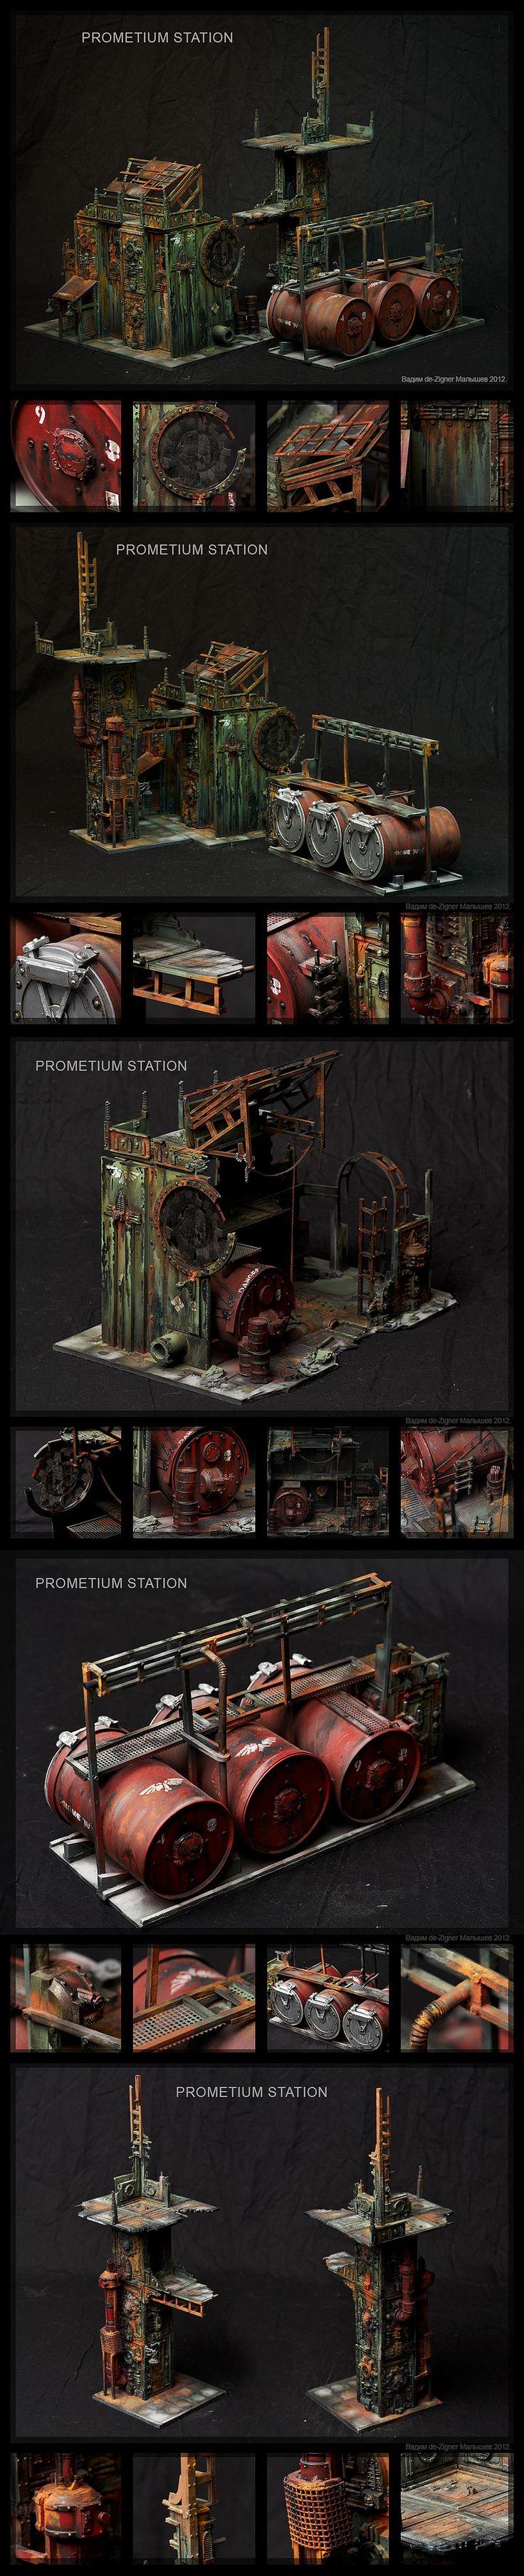 Prometium Station Diorama Model.